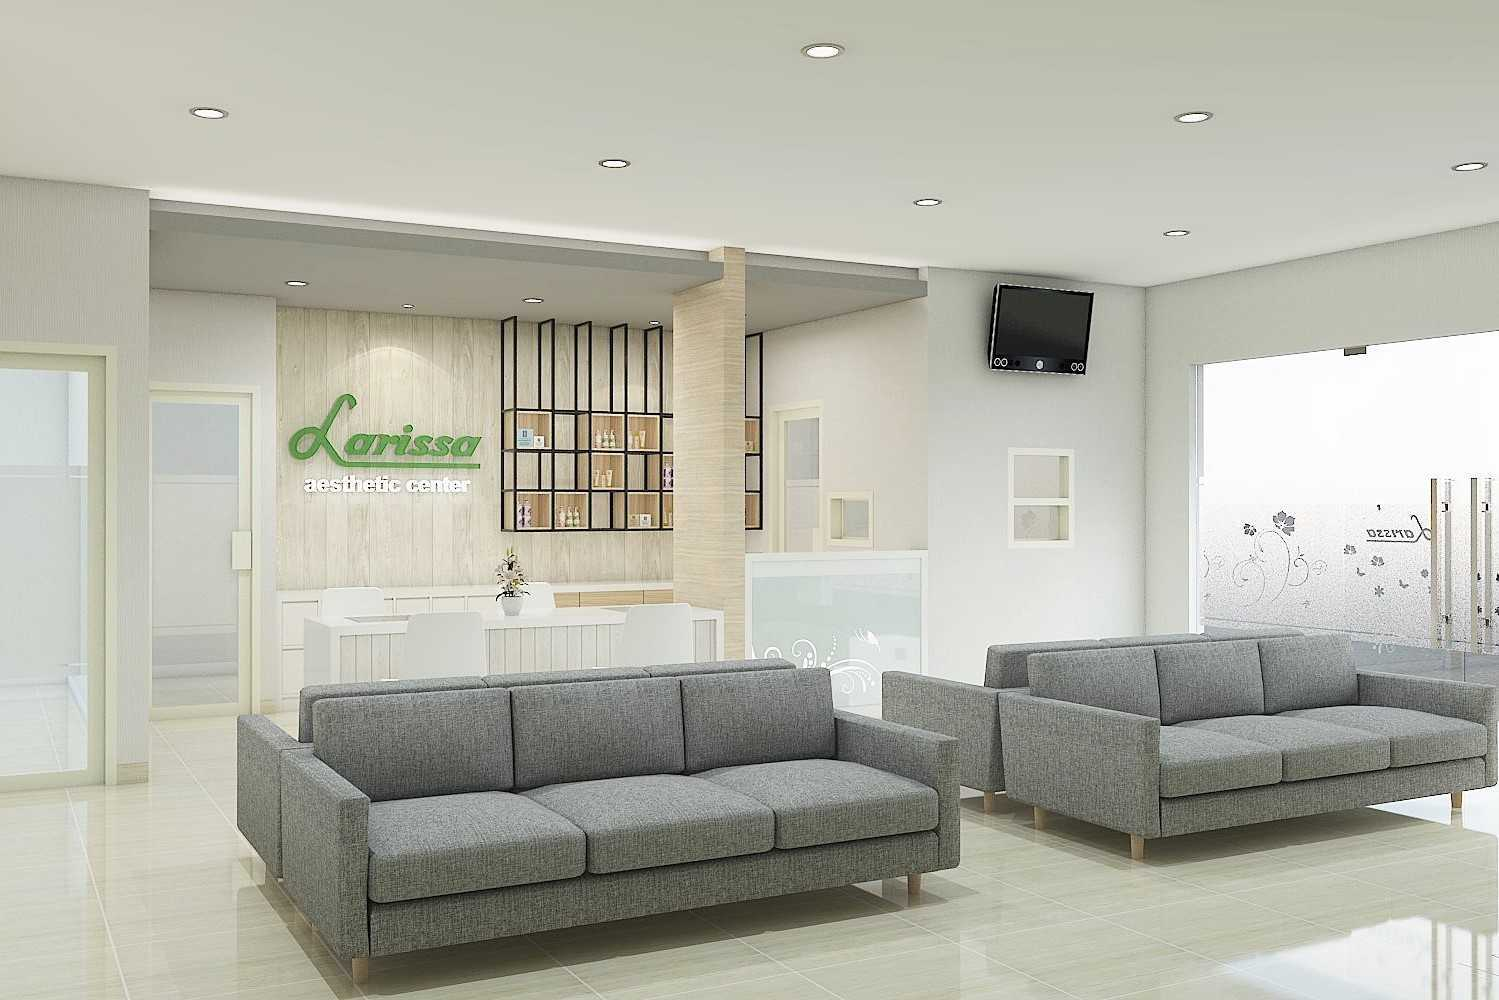 Conarch Studio Larissa Aesthetic Center Surabaya Surabaya, Kota Sby, Jawa Timur, Indonesia Surabaya, Kota Sby, Jawa Timur, Indonesia Conarch-Bangun-Sejahtera-Larissa-Aesthetic-Center-Surabaya  82278